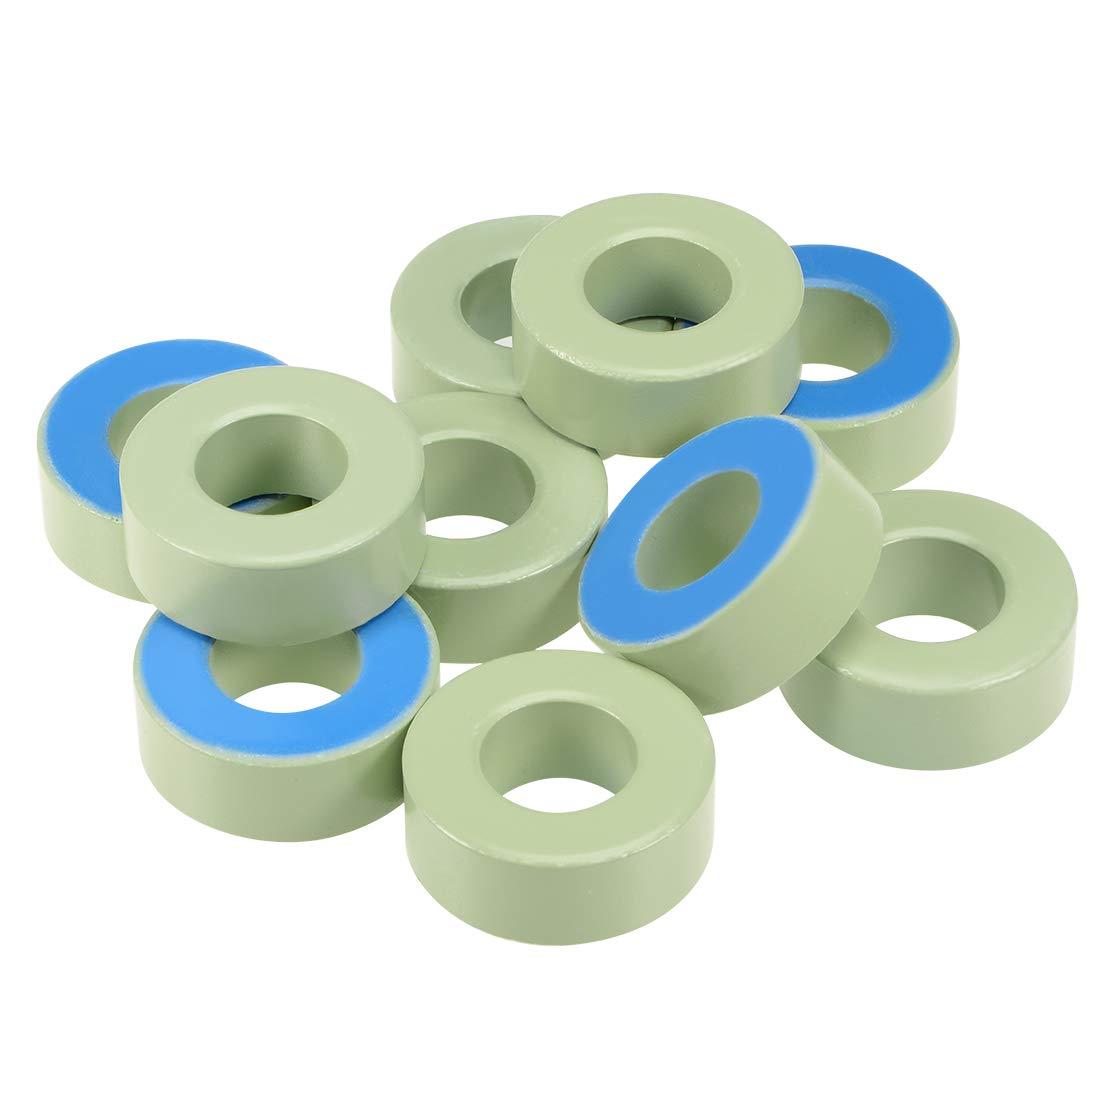 uxcell 10pcs 23.8X 47 x 18.2mm Ferrite Ring Iron Powder Toroid Cores Light Green Blue